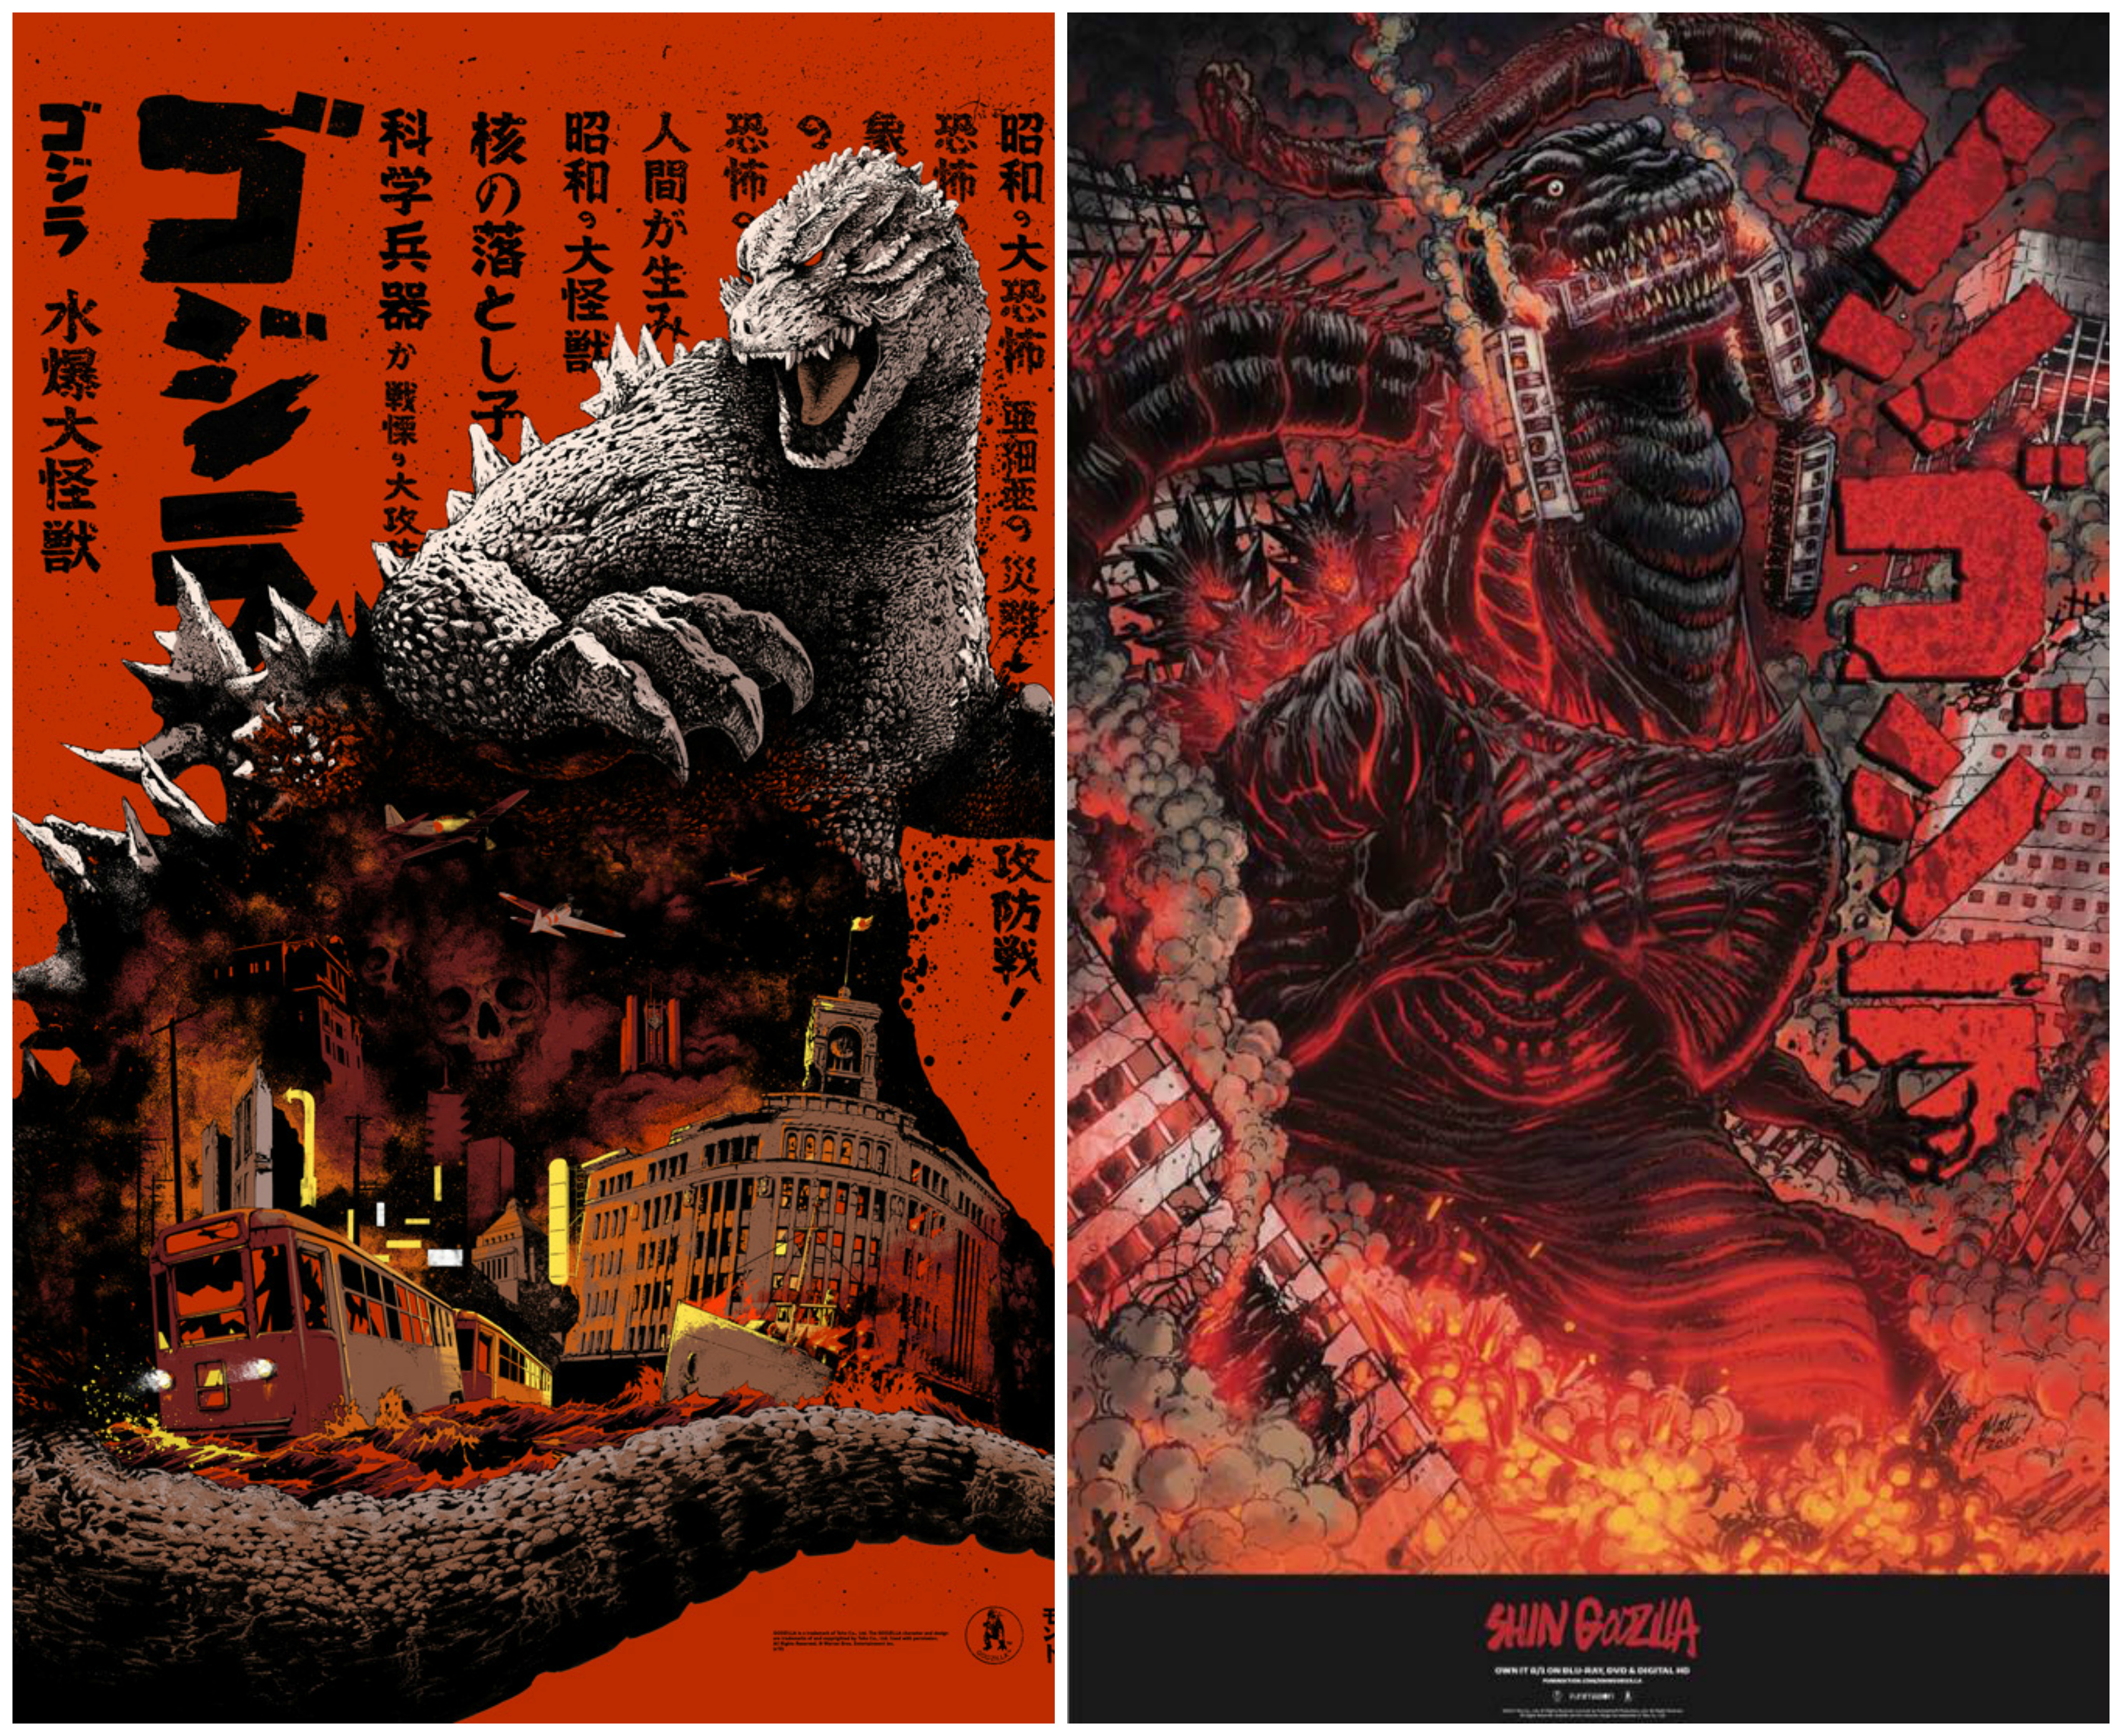 Podcasts] Test Pattern – Episode 52: GOJIRA! – Godzilla